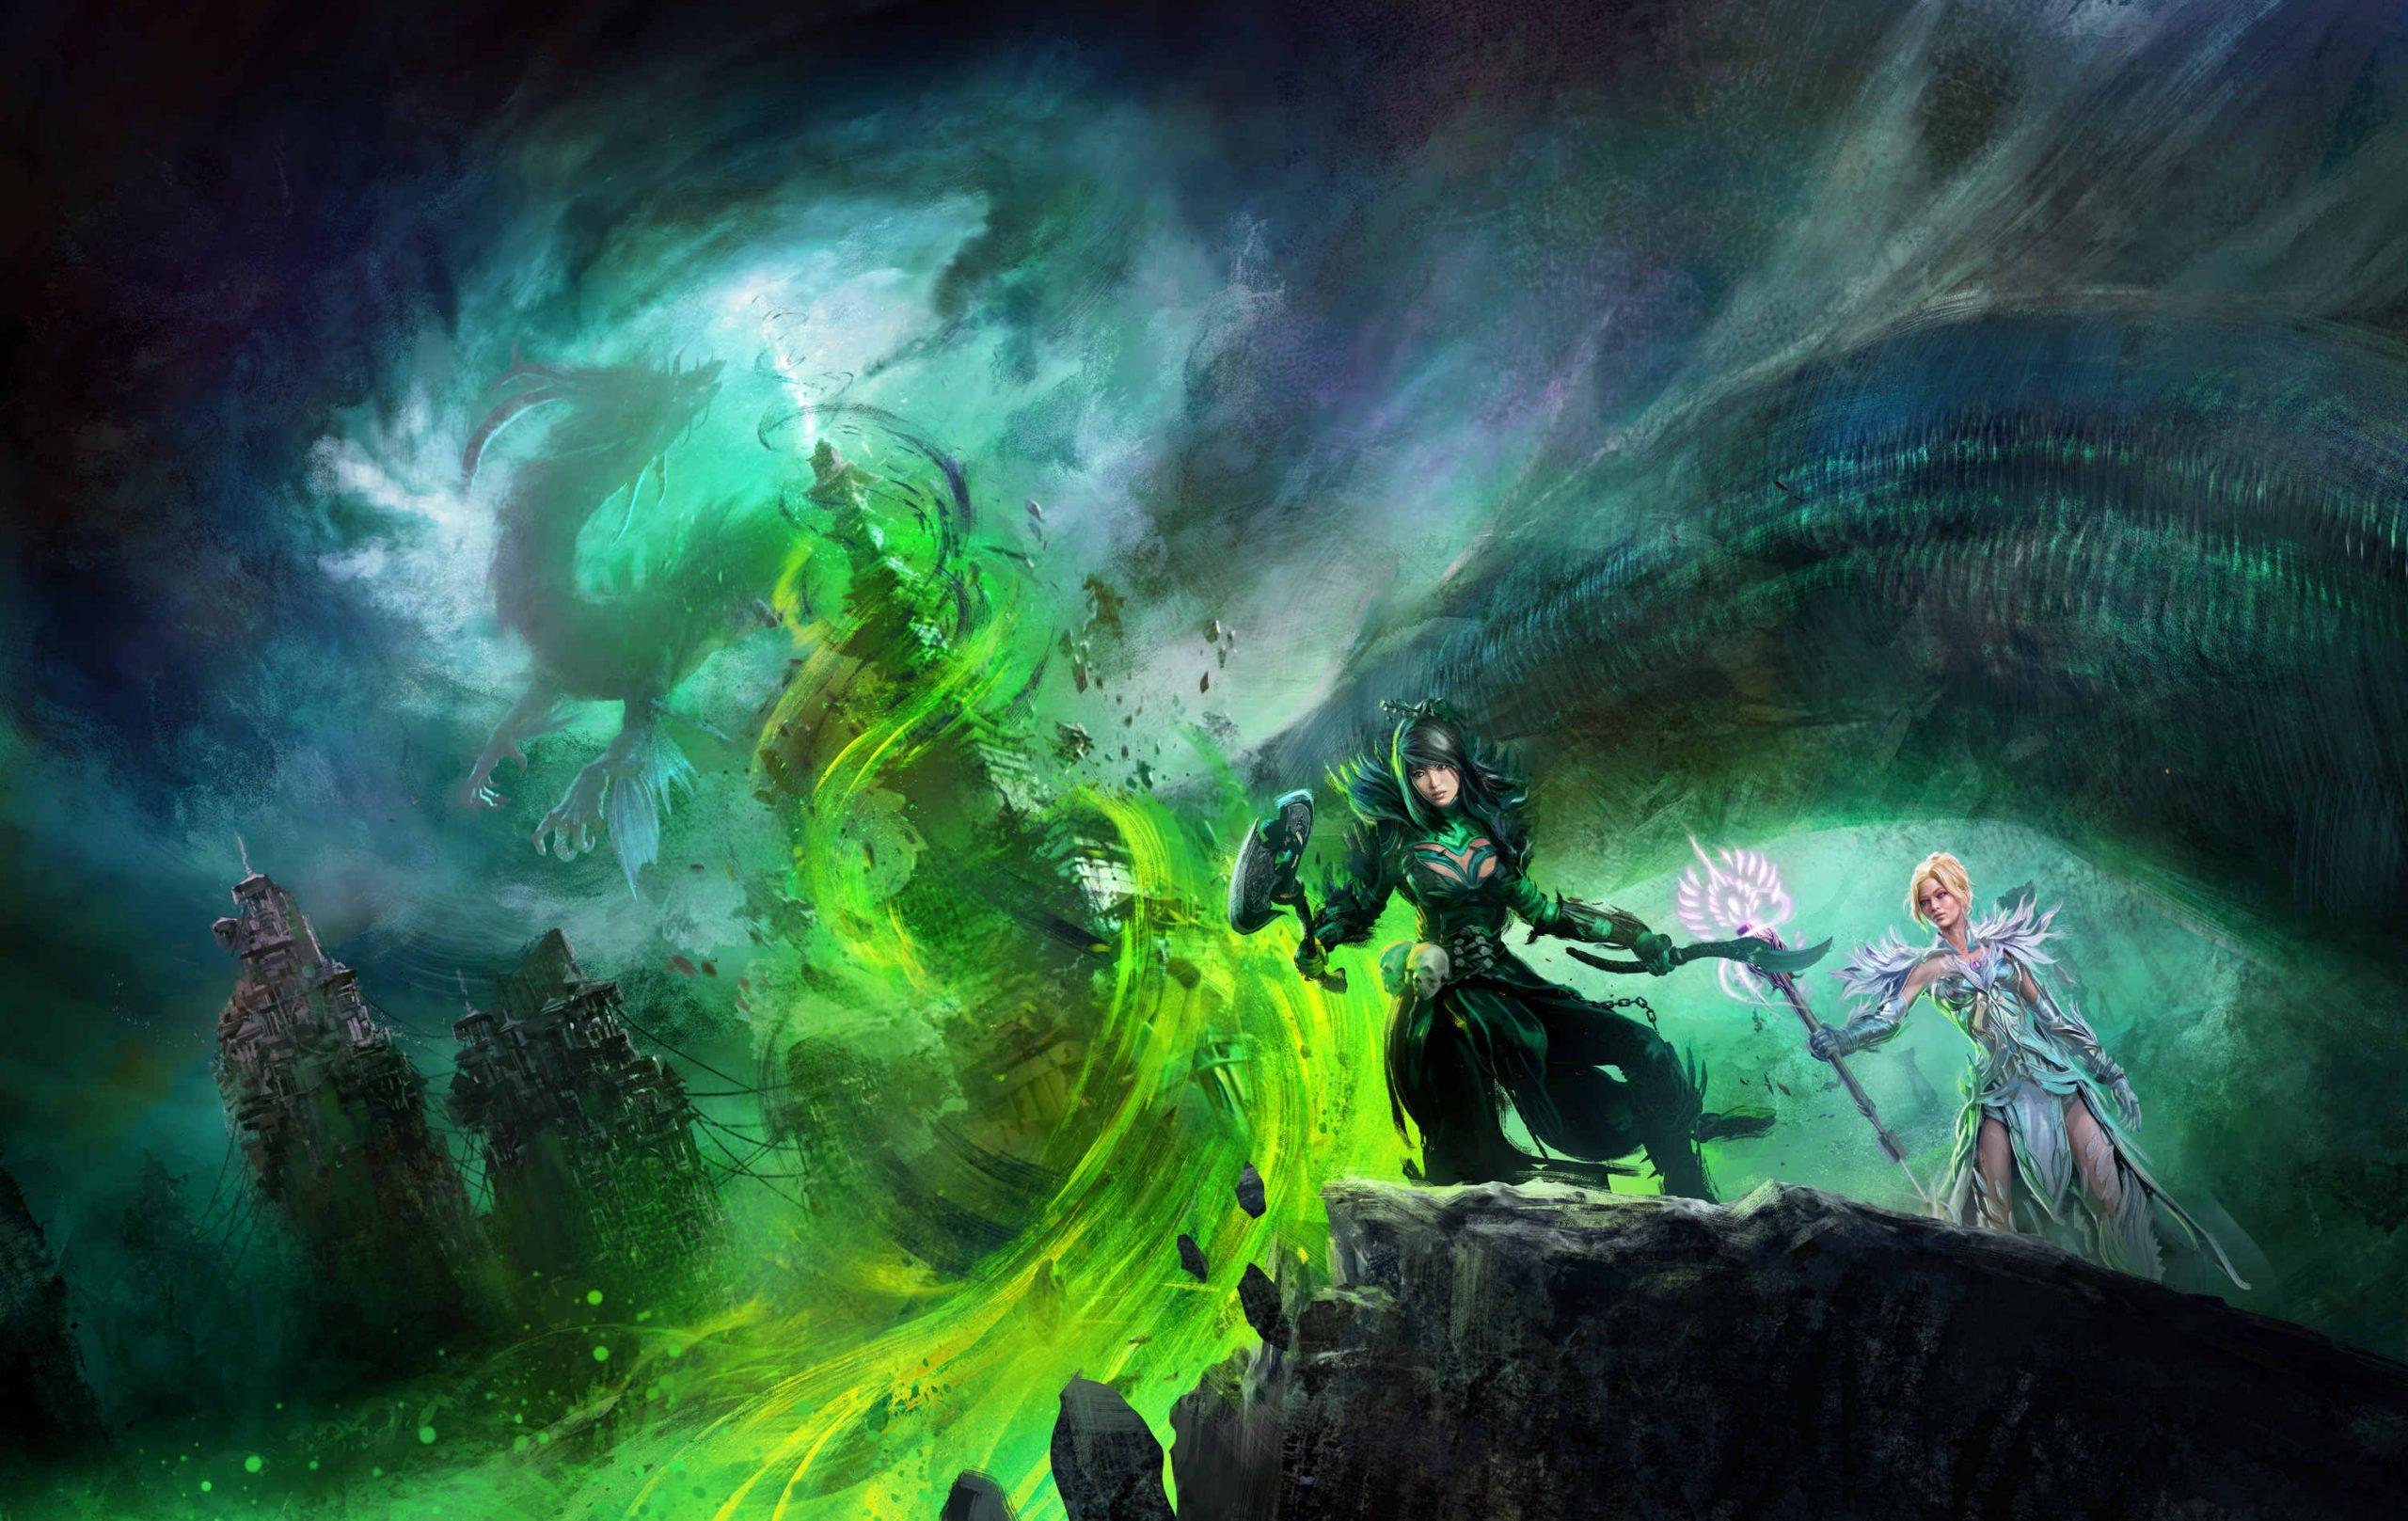 Guild Wars 2 end of dragons GW2 end of dragons GW2 EOD Key Artwork Sea Dragon